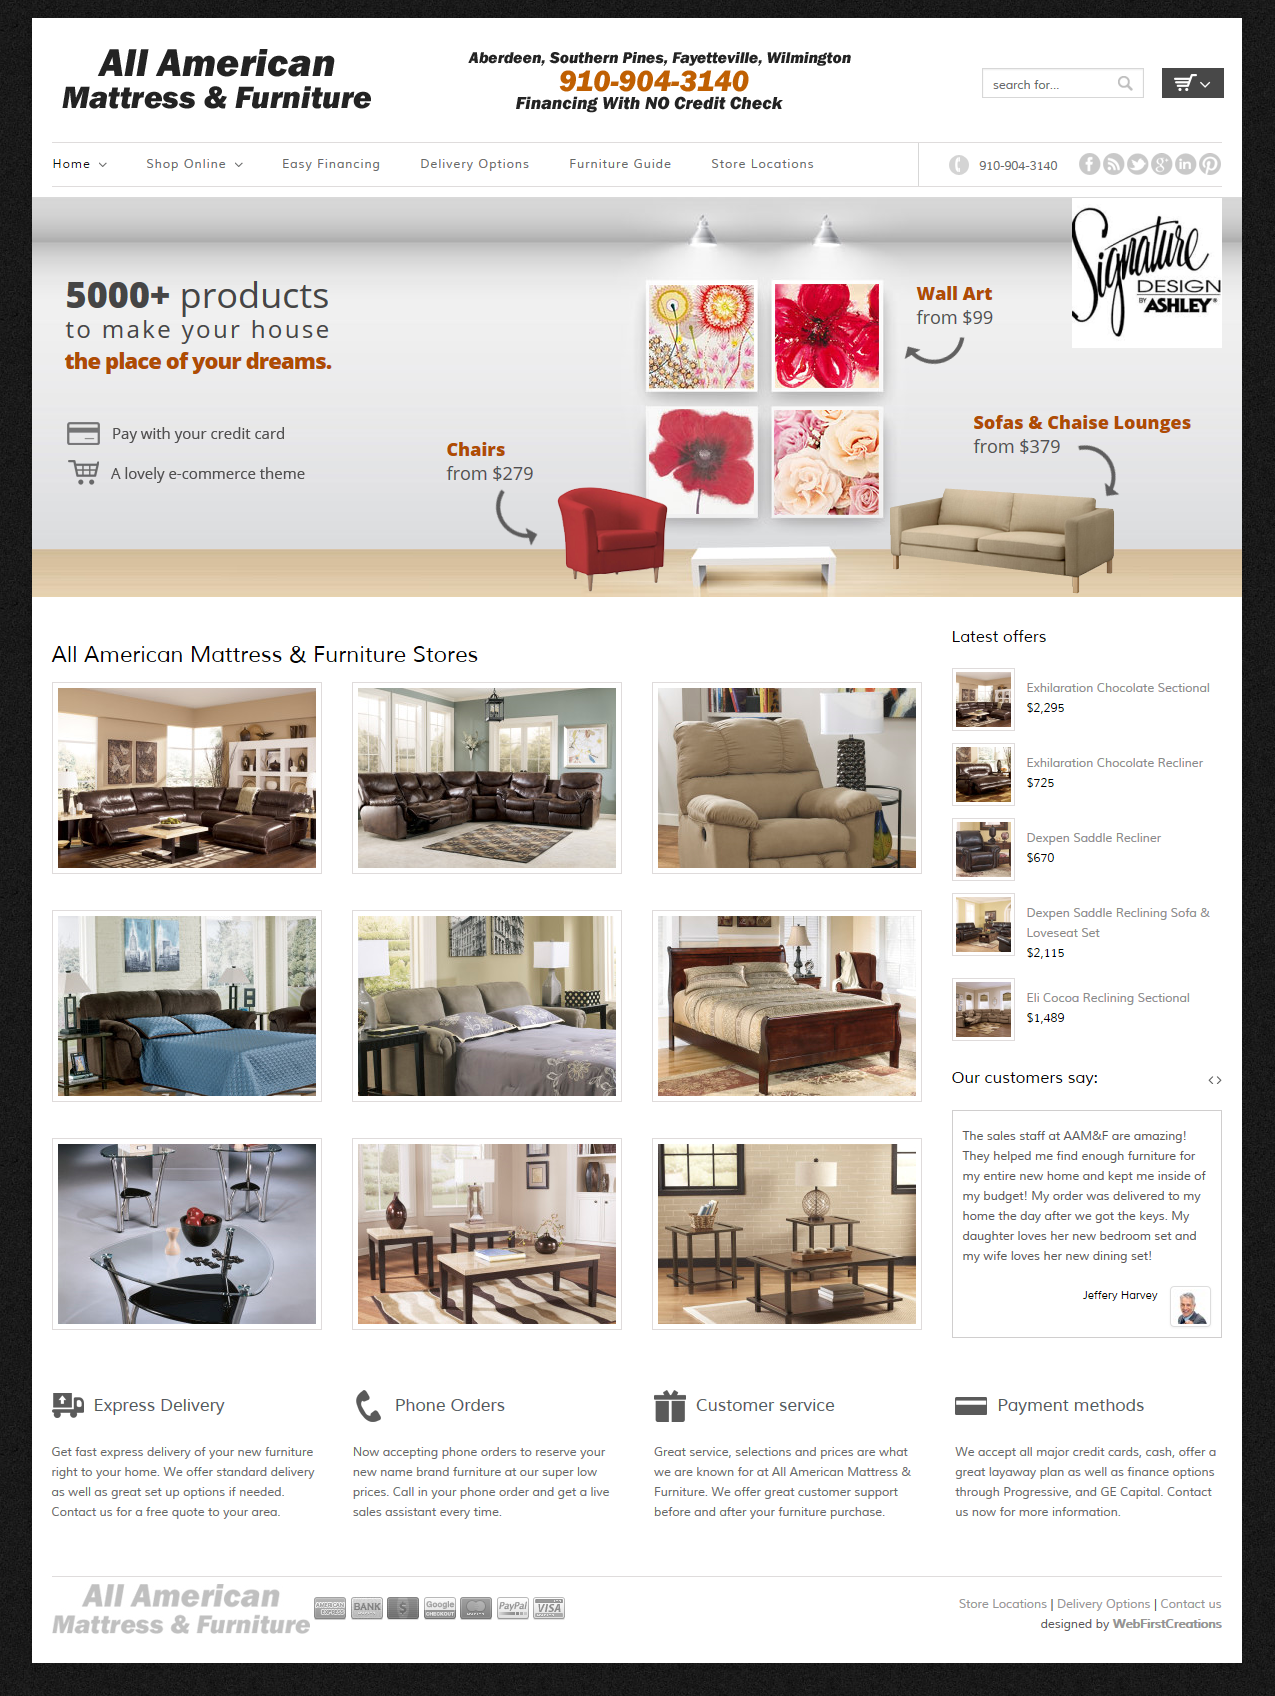 Amazing New Shopping Cart Site For All American Mattress U0026 Furniture Of Aberdeen NC